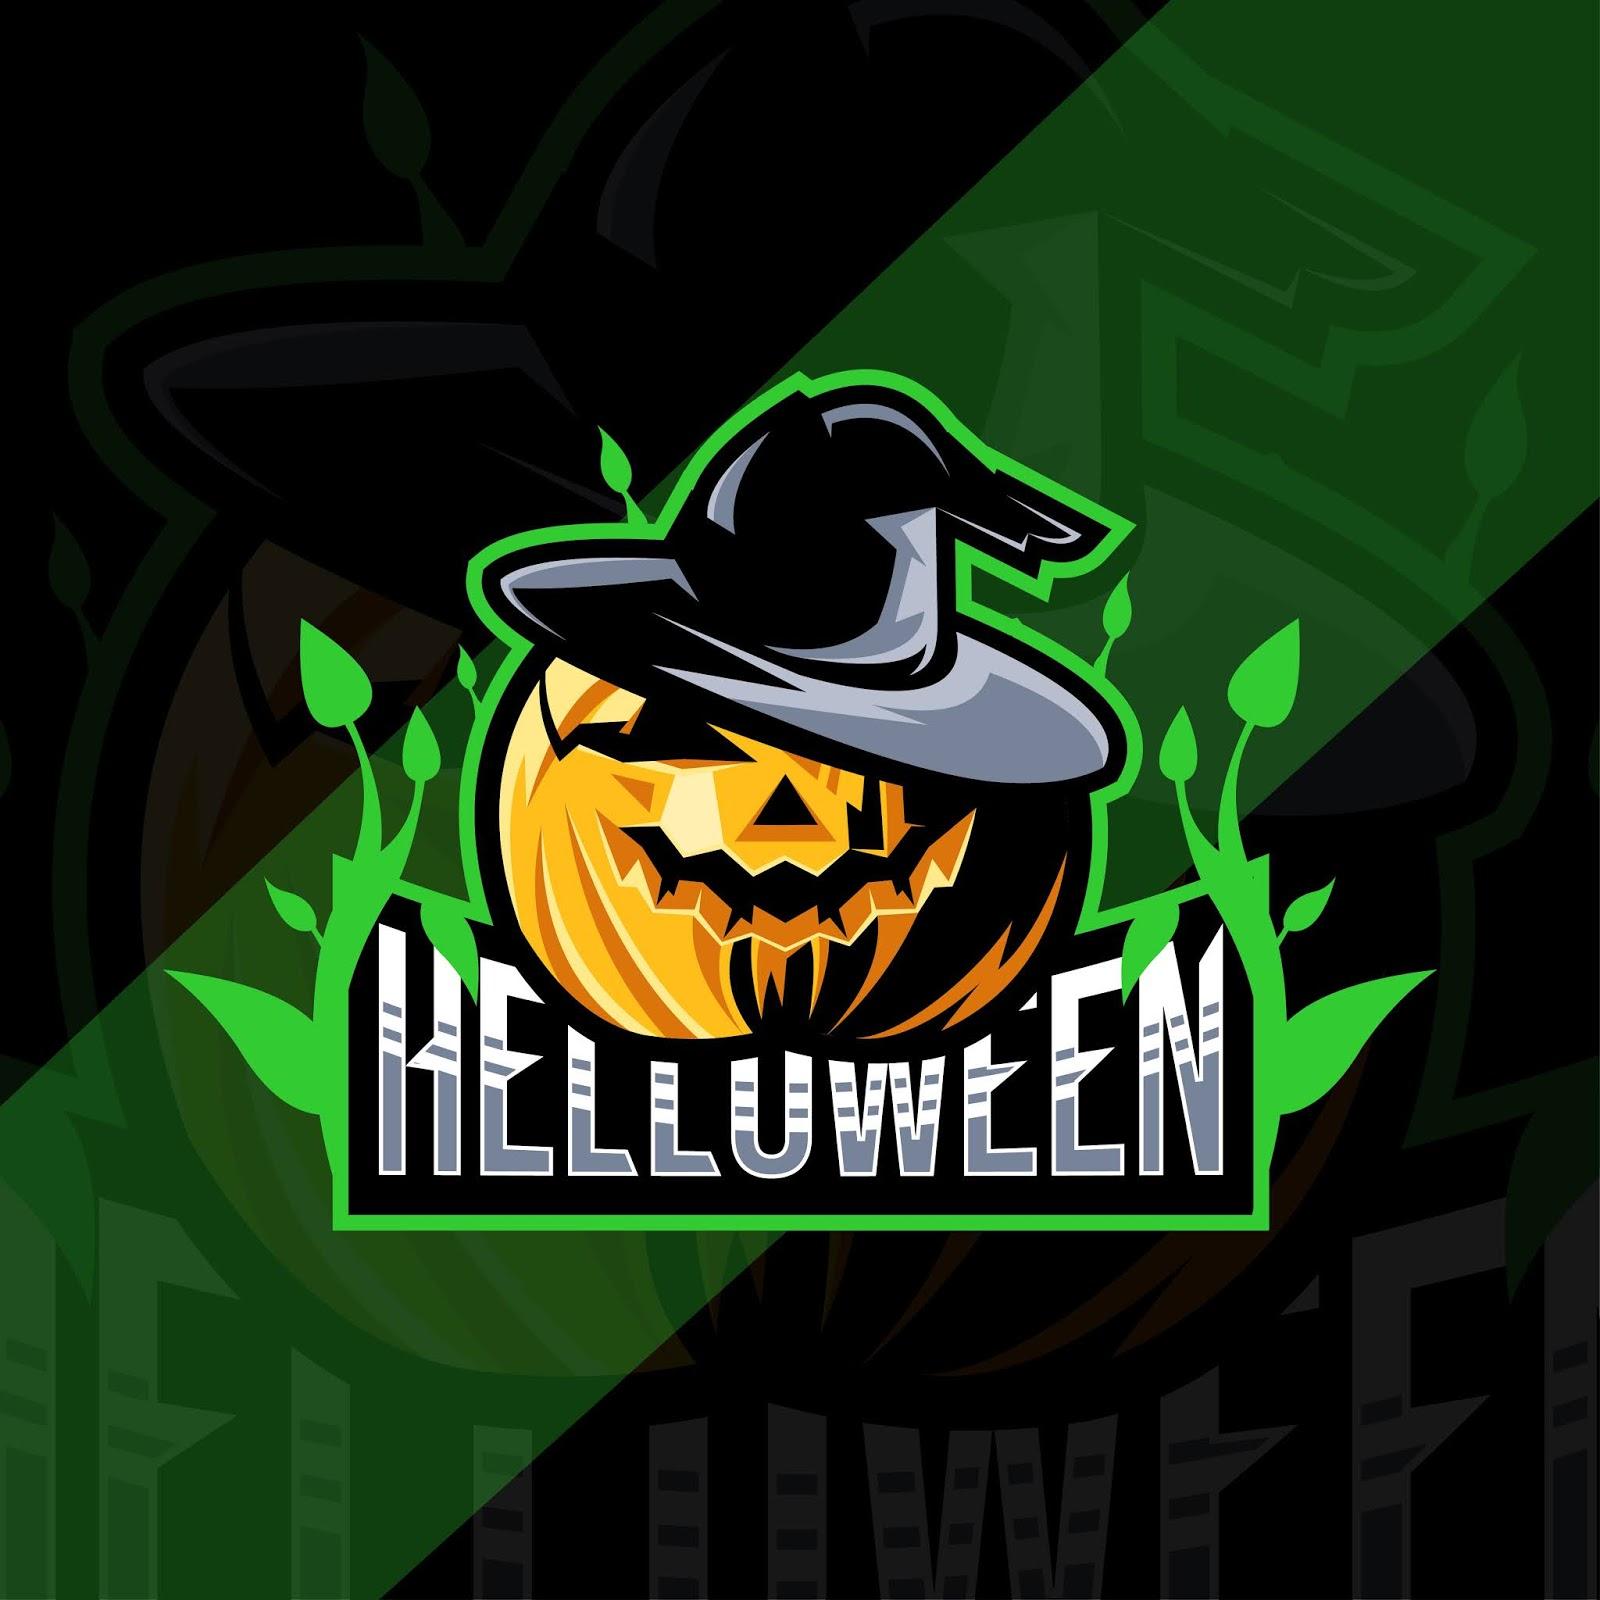 Helloween Pumpkin Mascot Esport Design Free Download Vector CDR, AI, EPS and PNG Formats